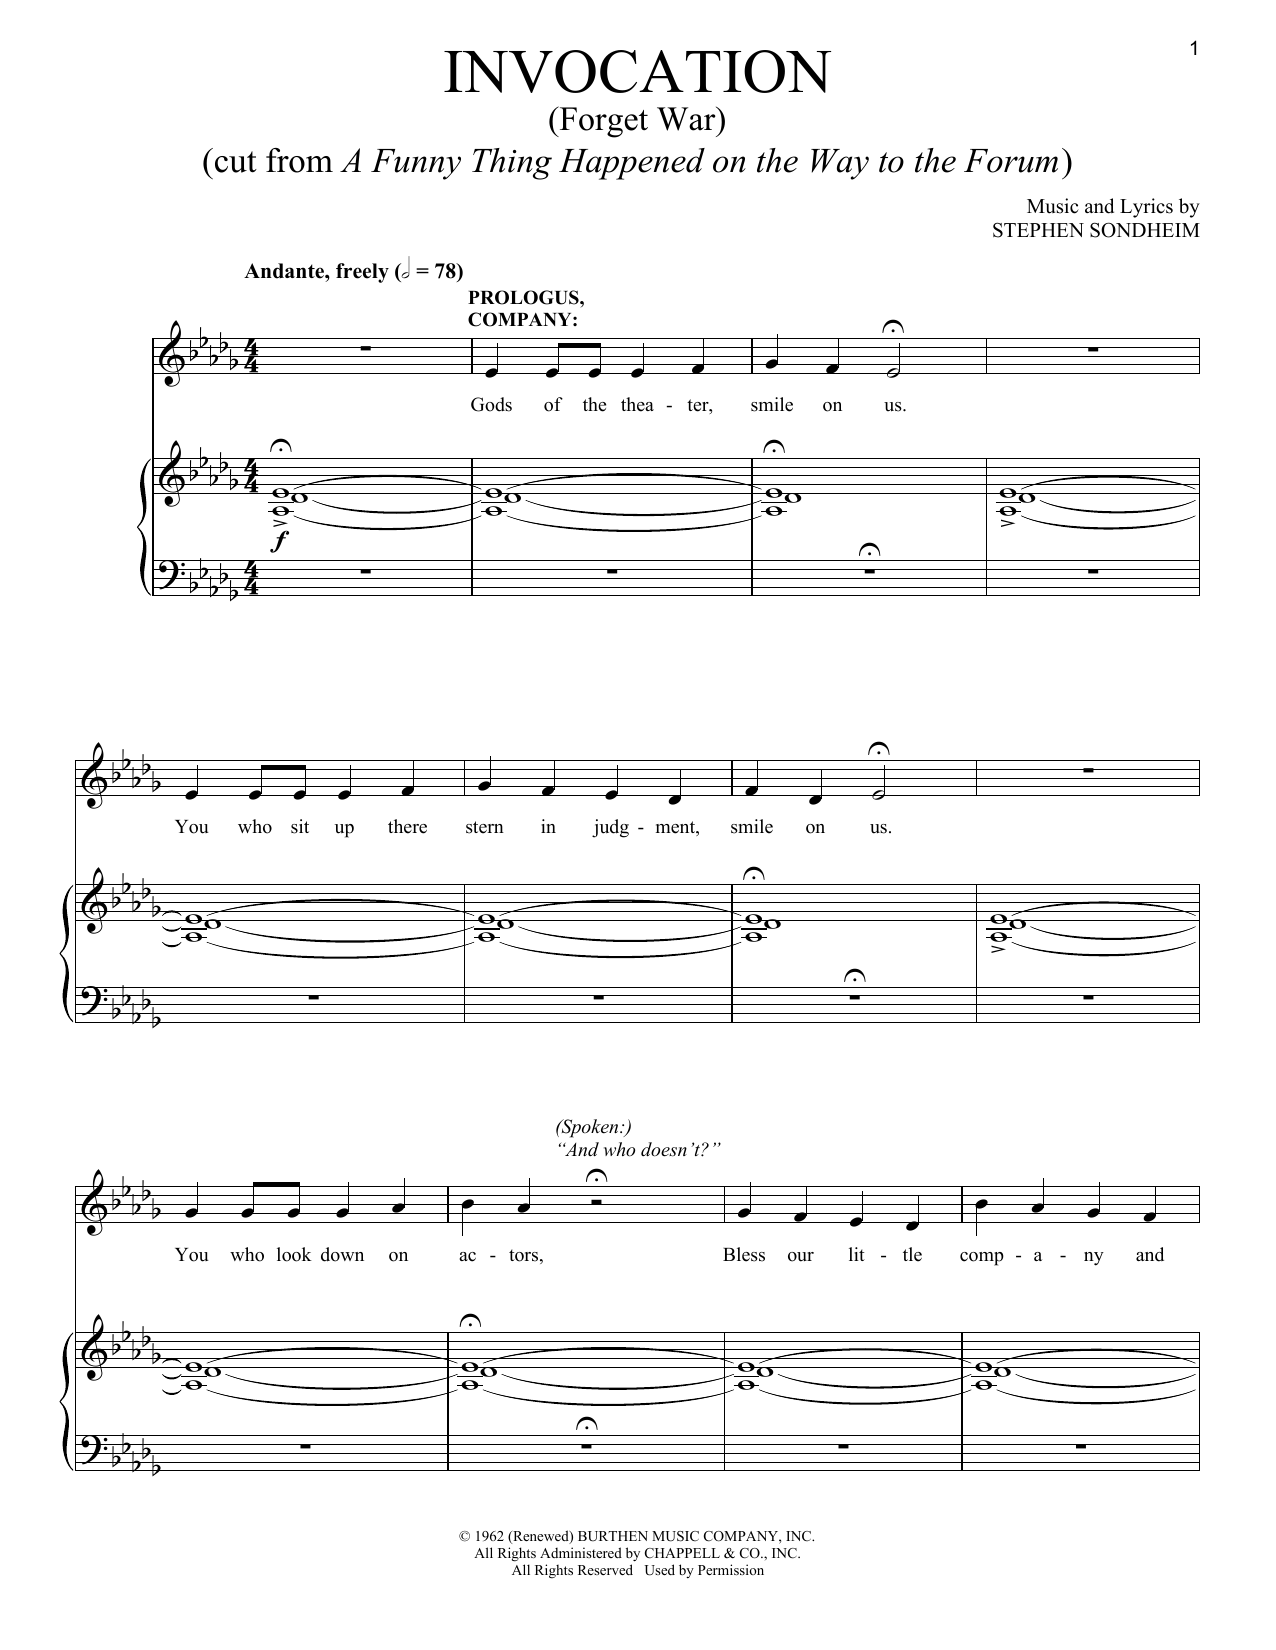 Stephen Sondheim Invocation (Forget War) sheet music notes and chords. Download Printable PDF.